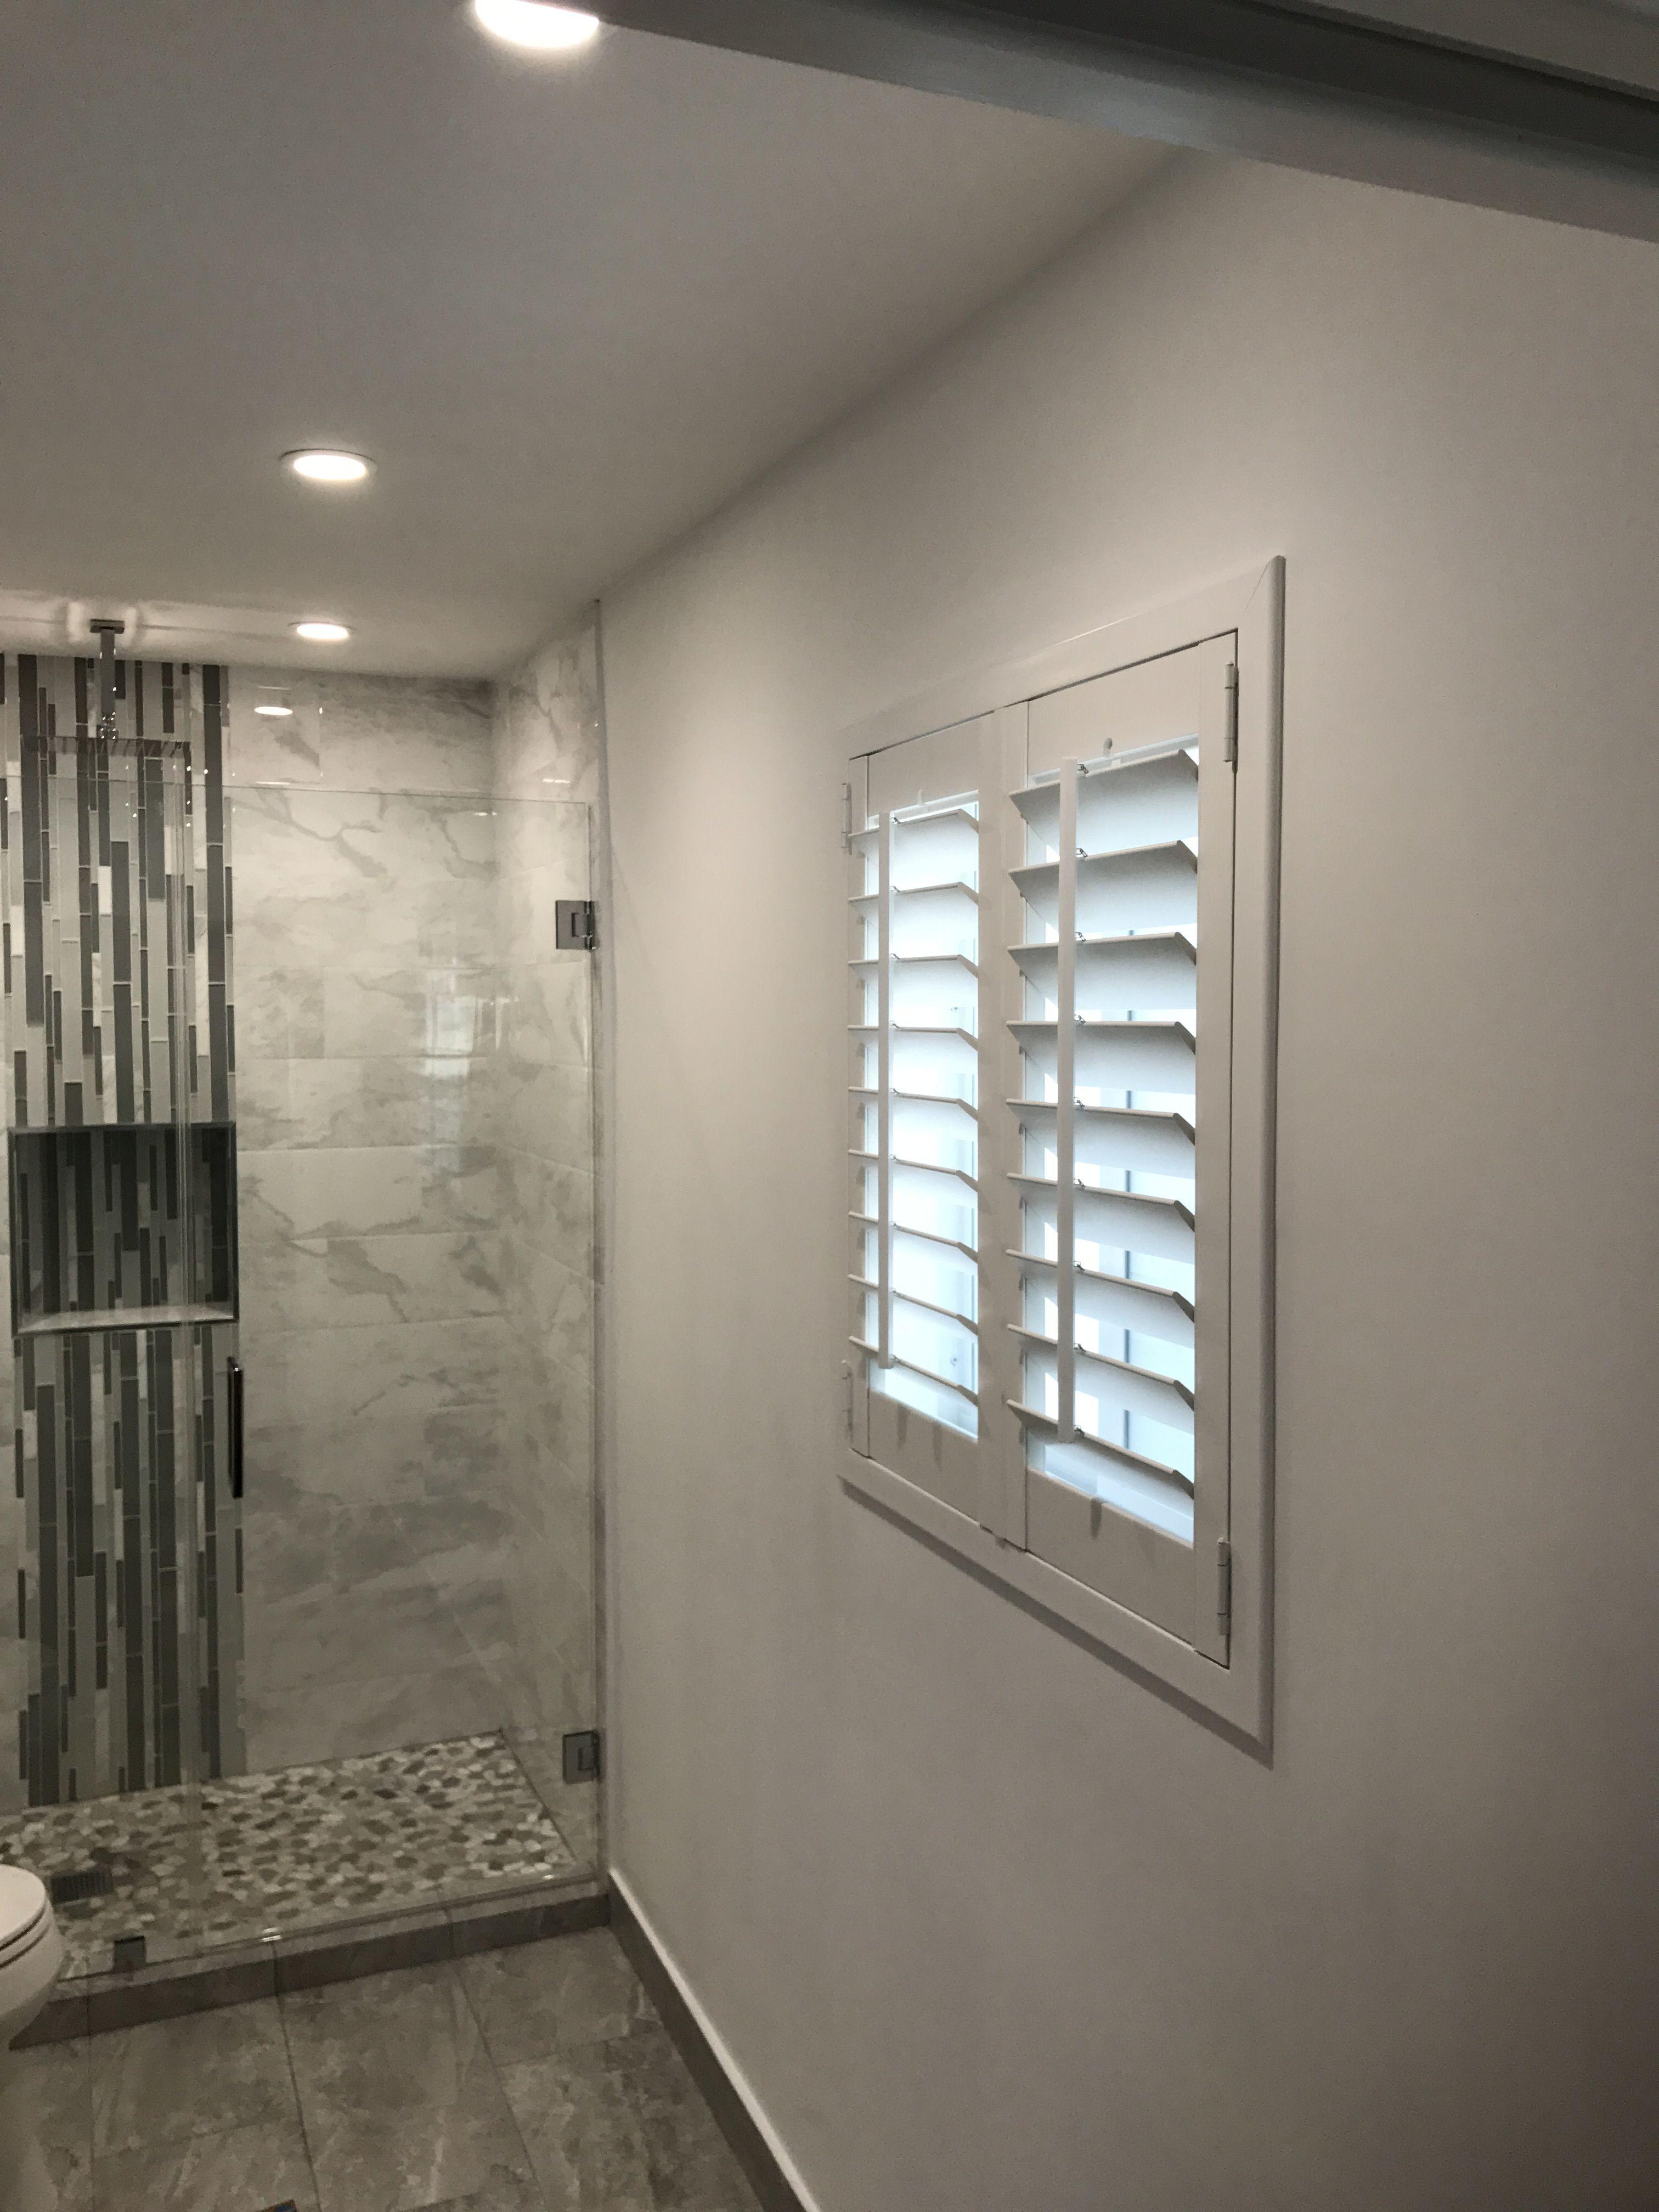 Bathroom four sided frame plantation shutter by elite decor miami